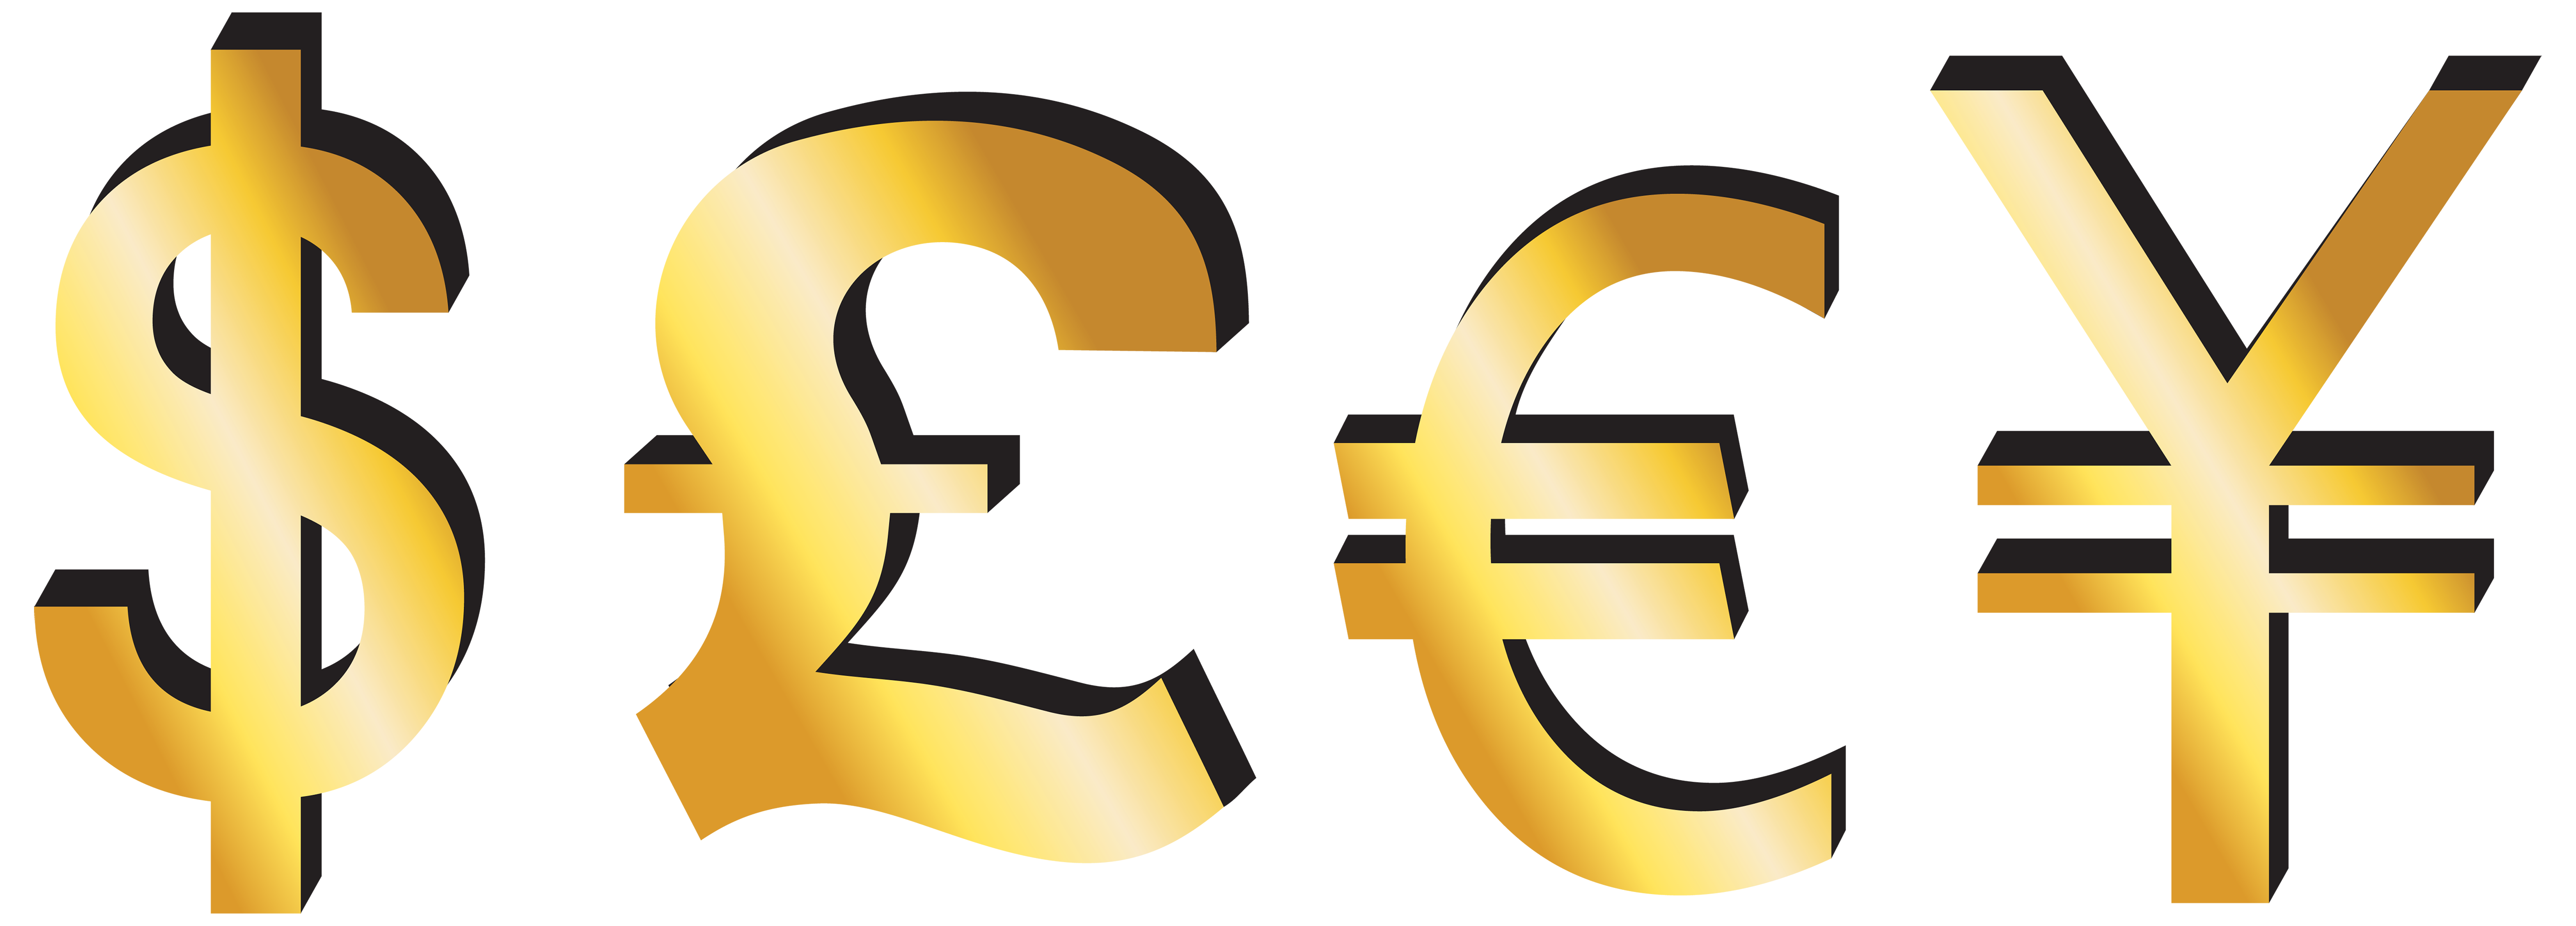 Money signs png. Dollar pound euro yen